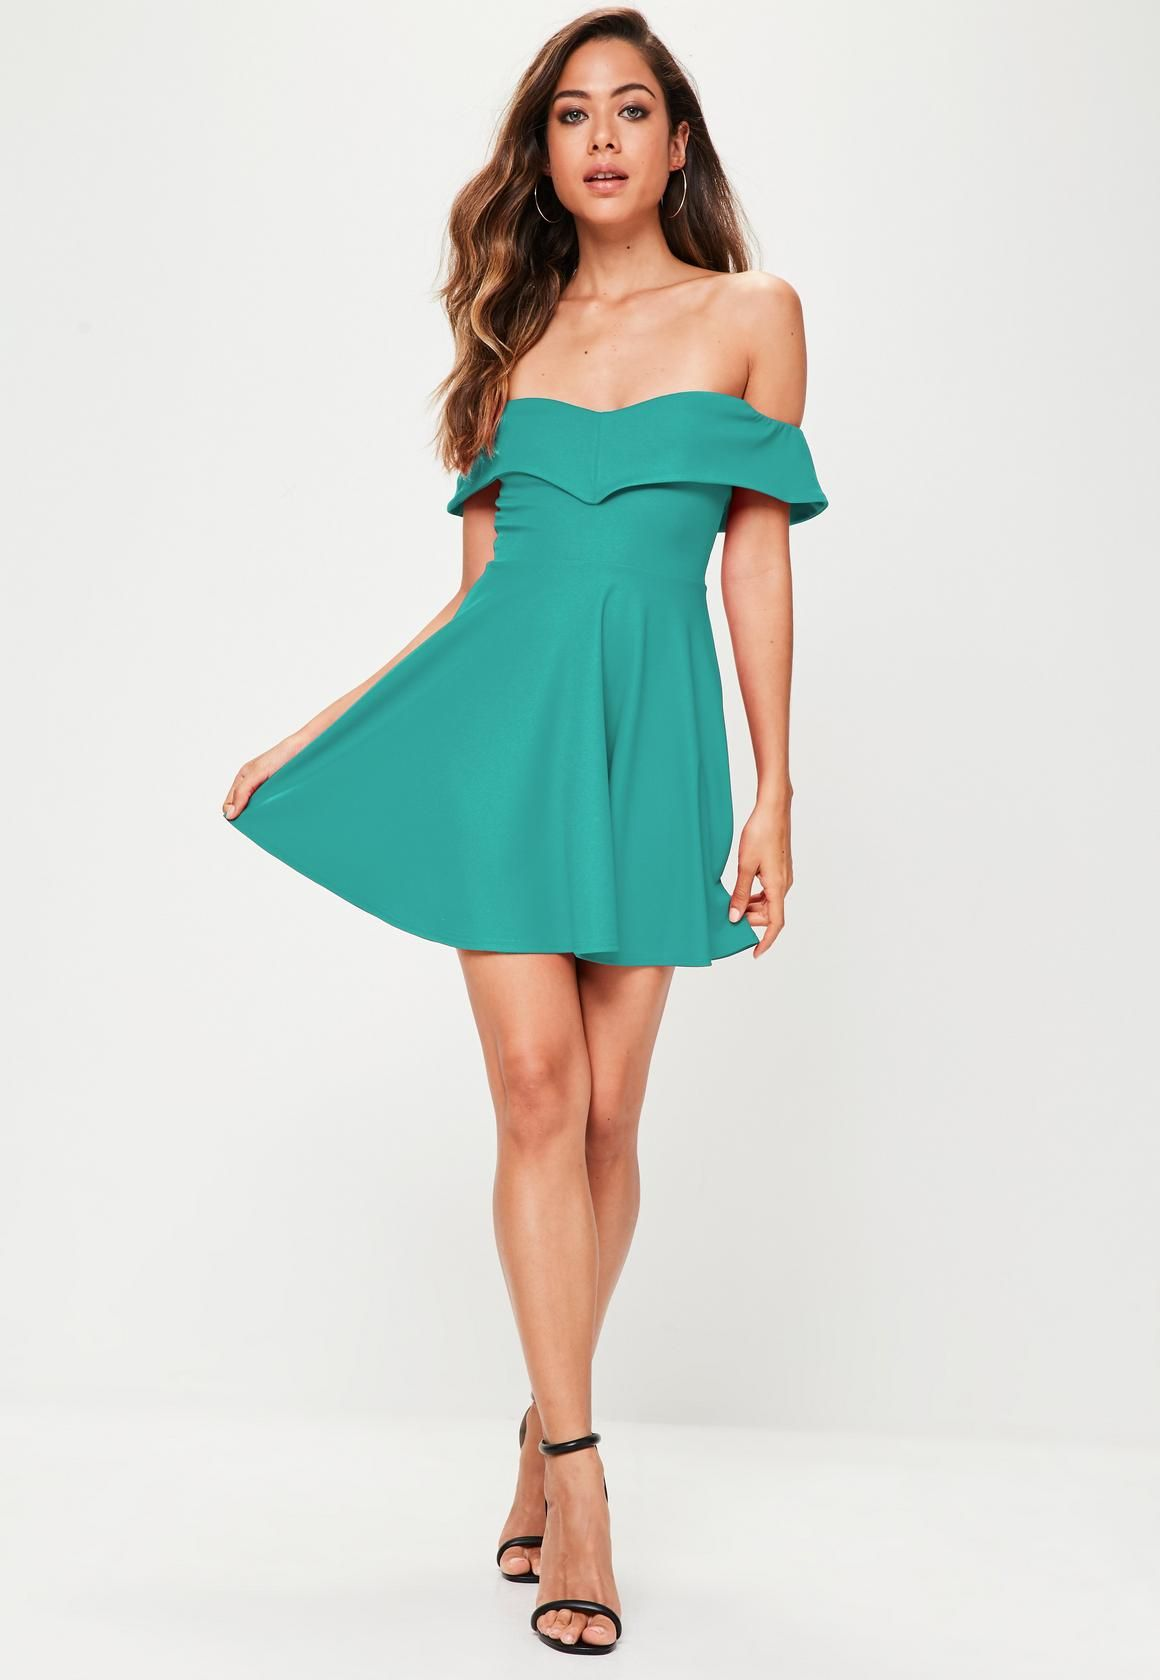 Missguided - Blue Teal Wrap Bardot Skater Dress | Party dresses ...